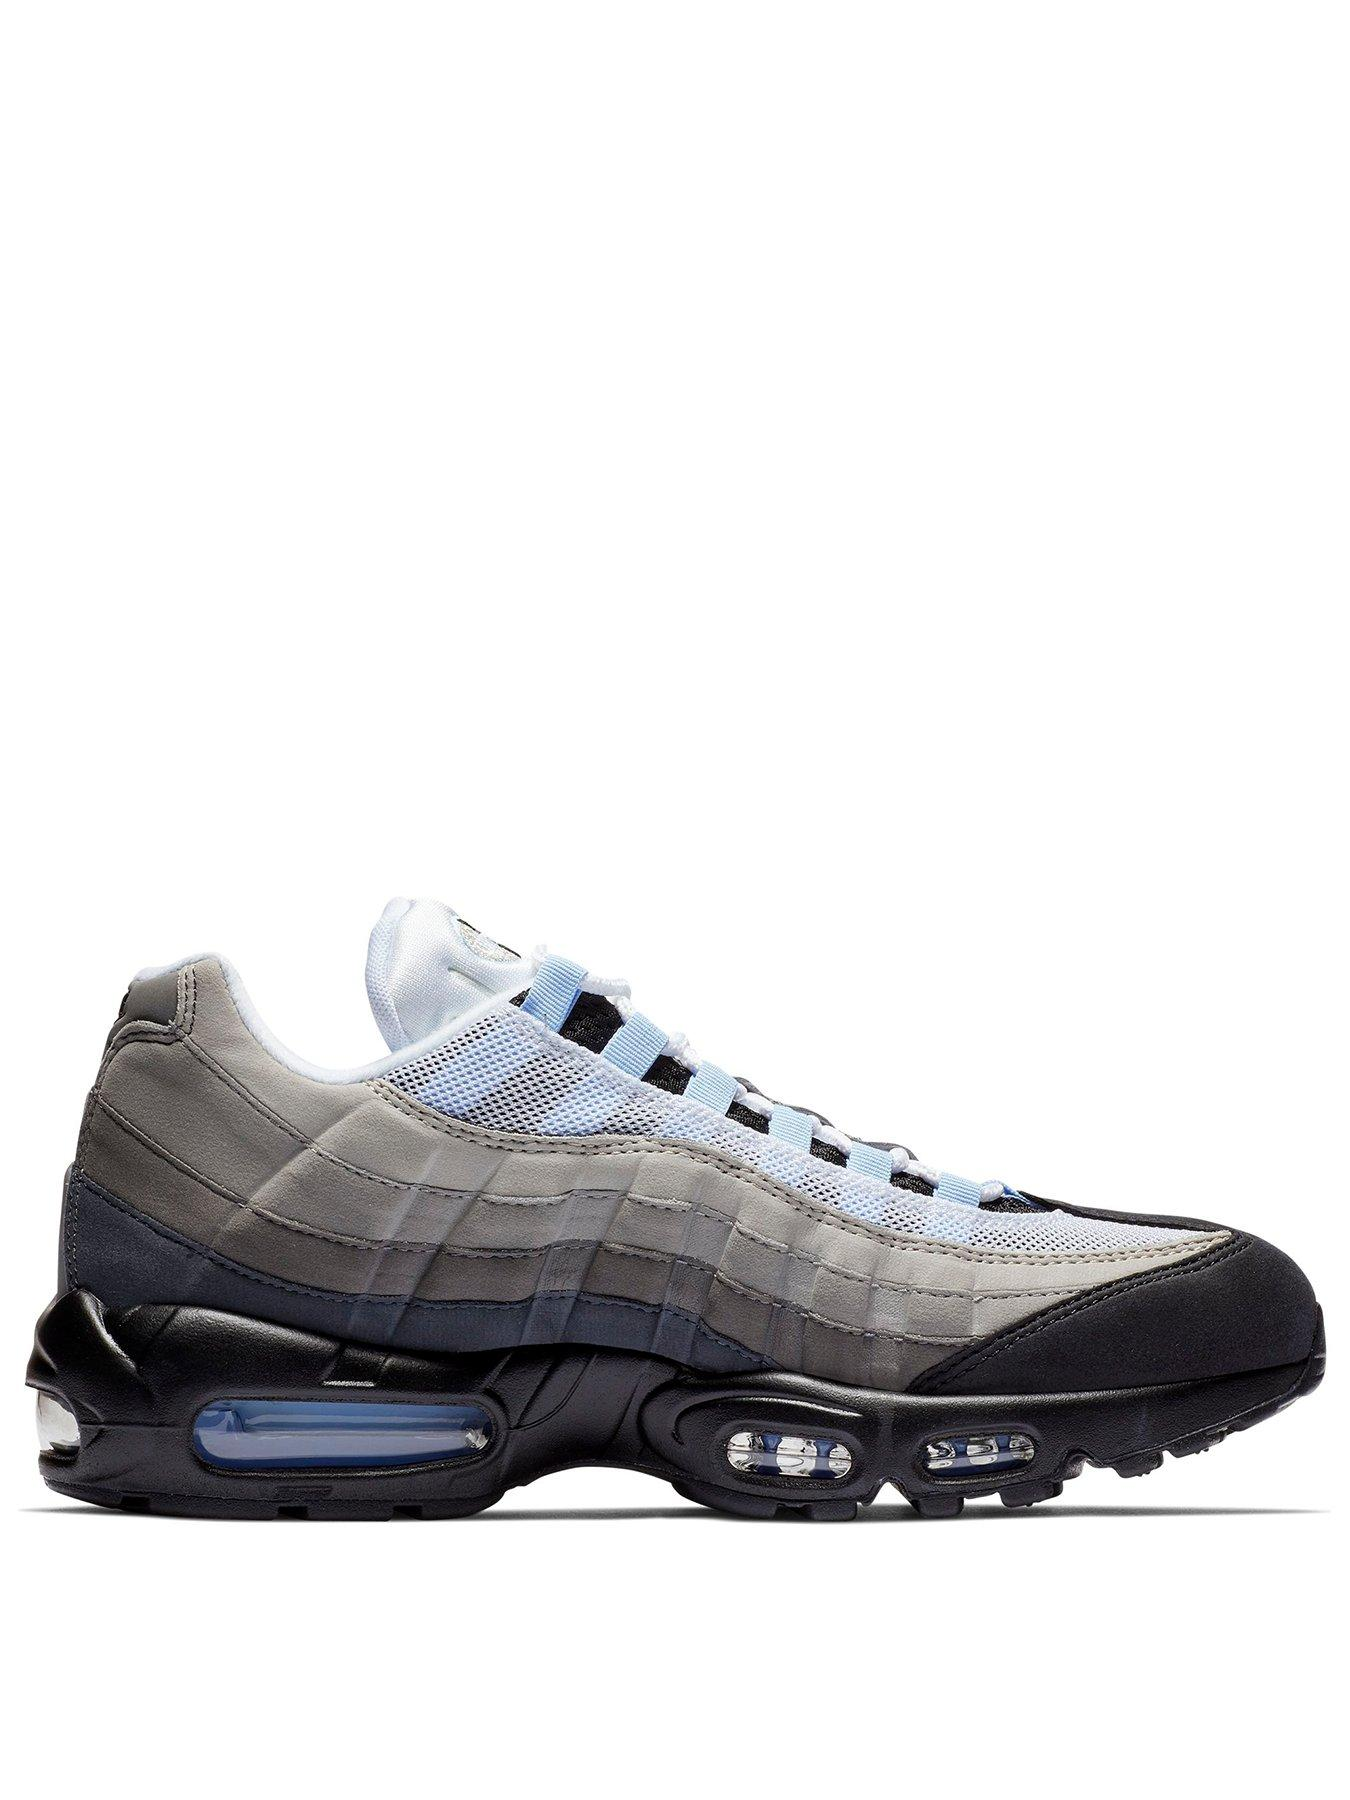 Details zu Nike Air Max 180 Night Ops Black Volt AQ6104 001